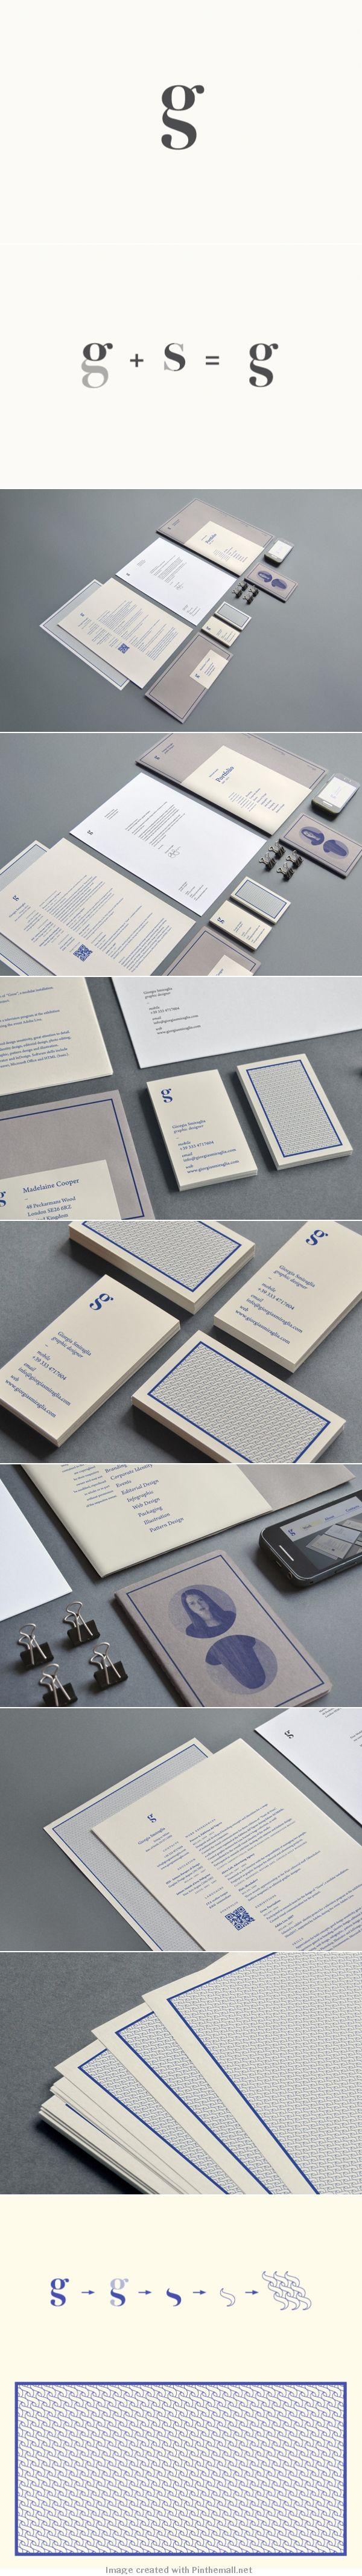 logo corporate photo visual graphic identity kraft paper design